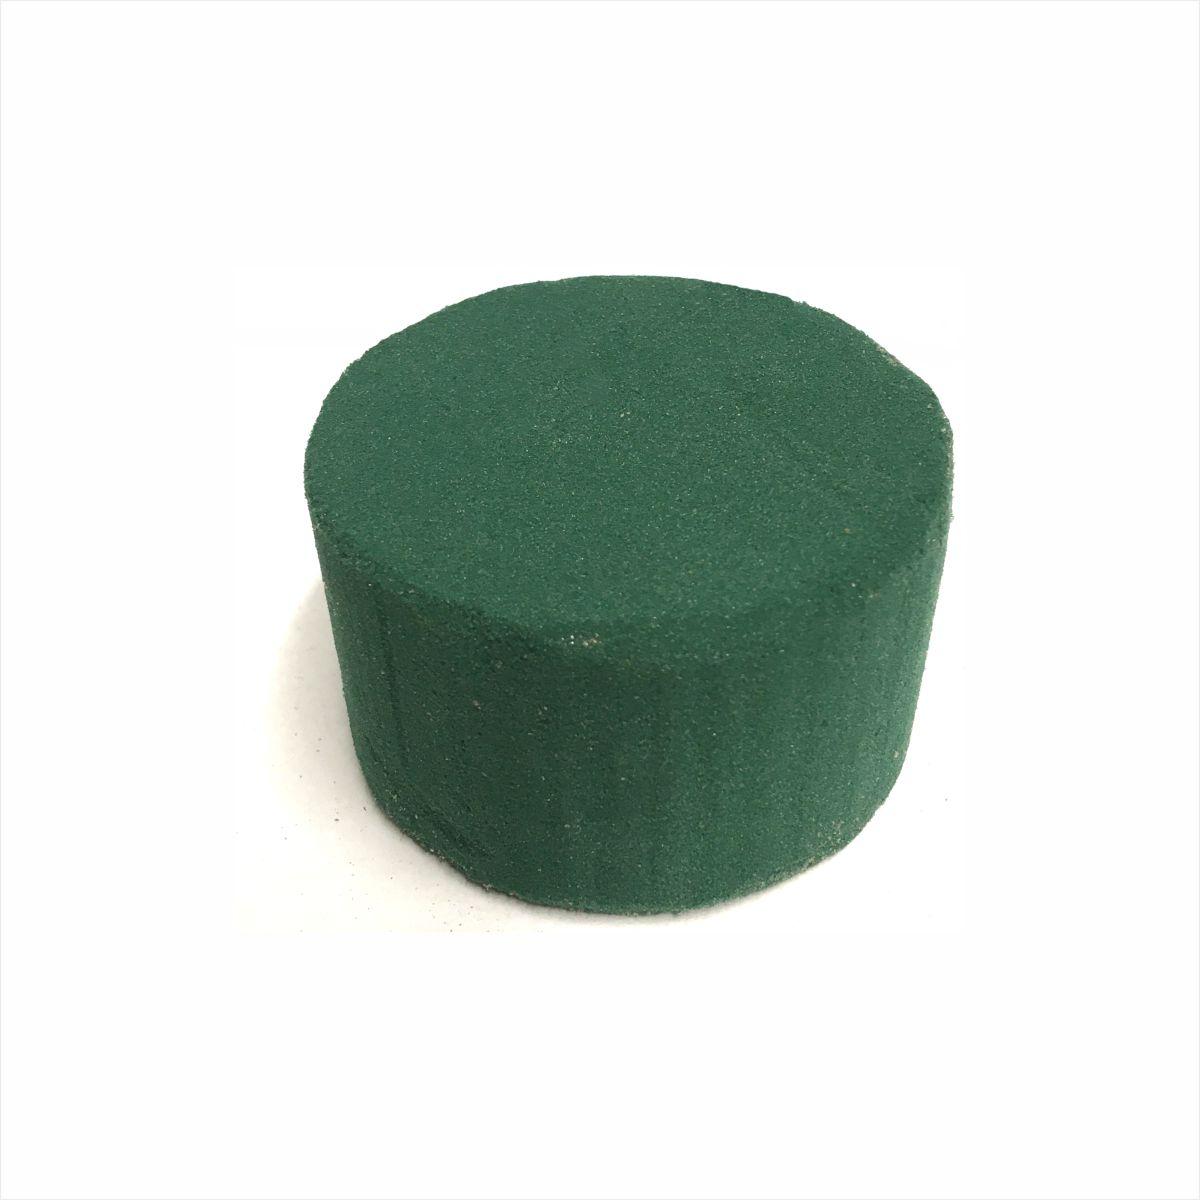 Gąbka florystyczna na mokro cylinder Victoria